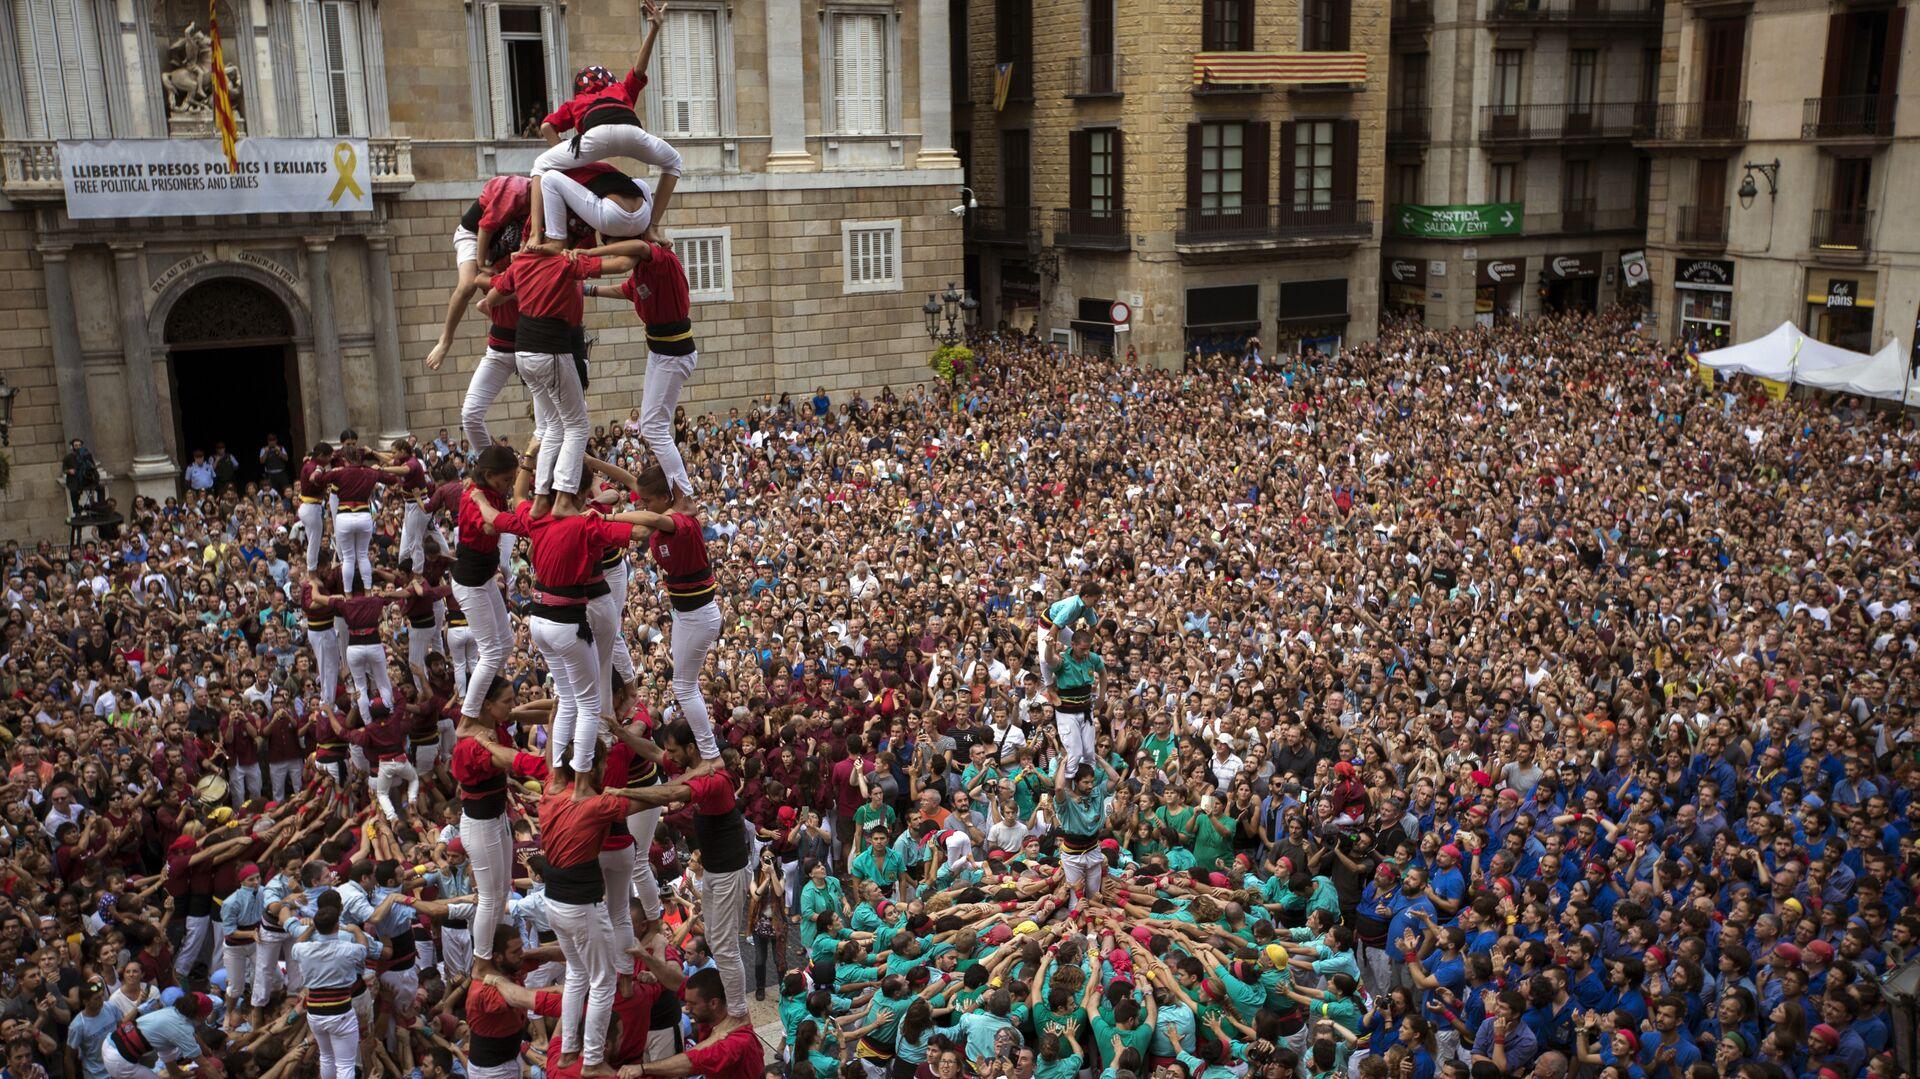 Participants make human towers or Castellers during the Saint Merce celebrations in San Jaime square in Barcelona, Spain, Monday, Sept. 24, 2018 - Sputnik Mundo, 1920, 30.09.2021